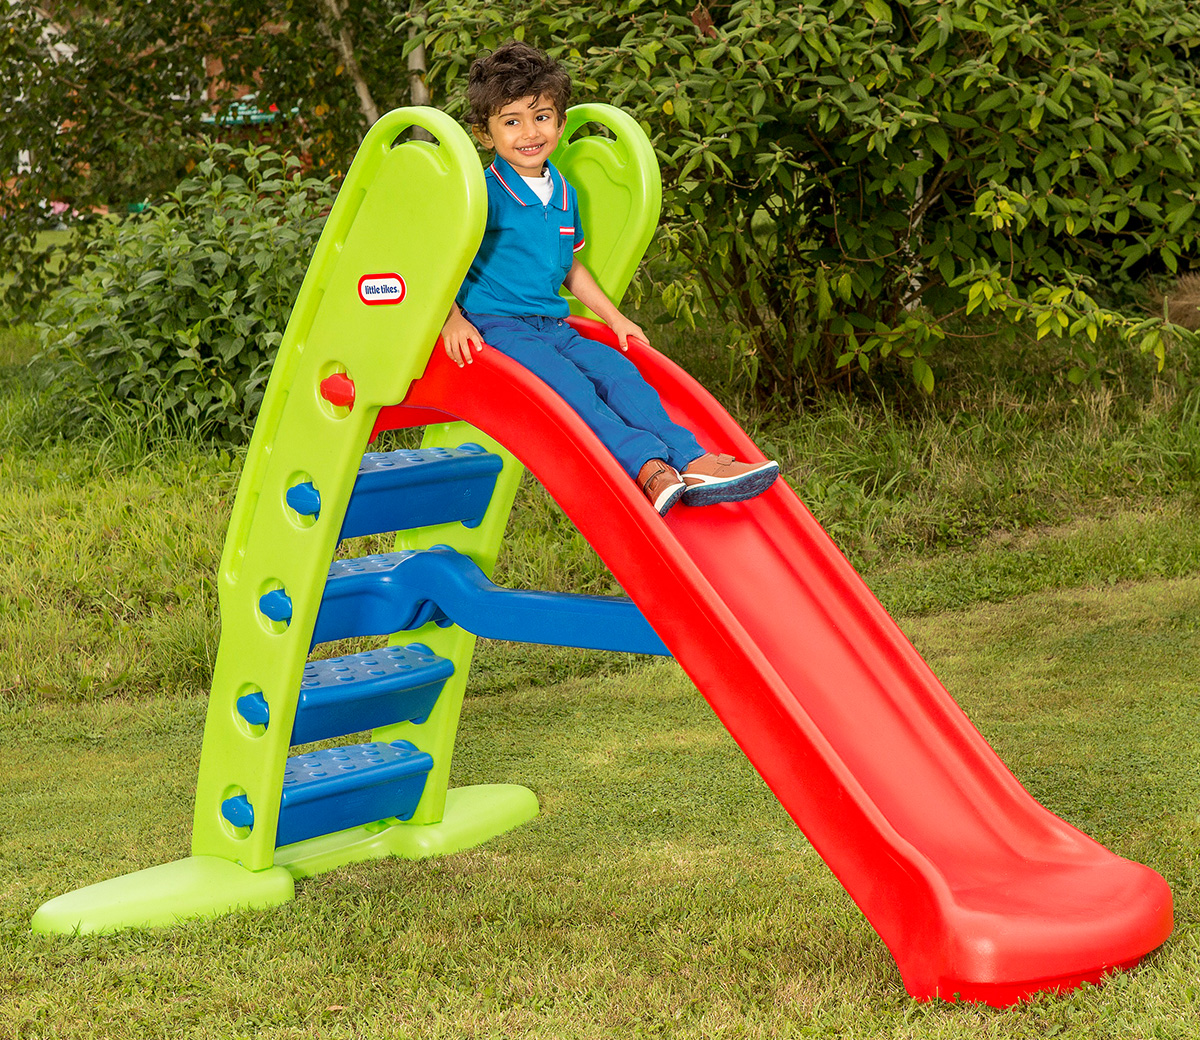 Slide-Primary-1